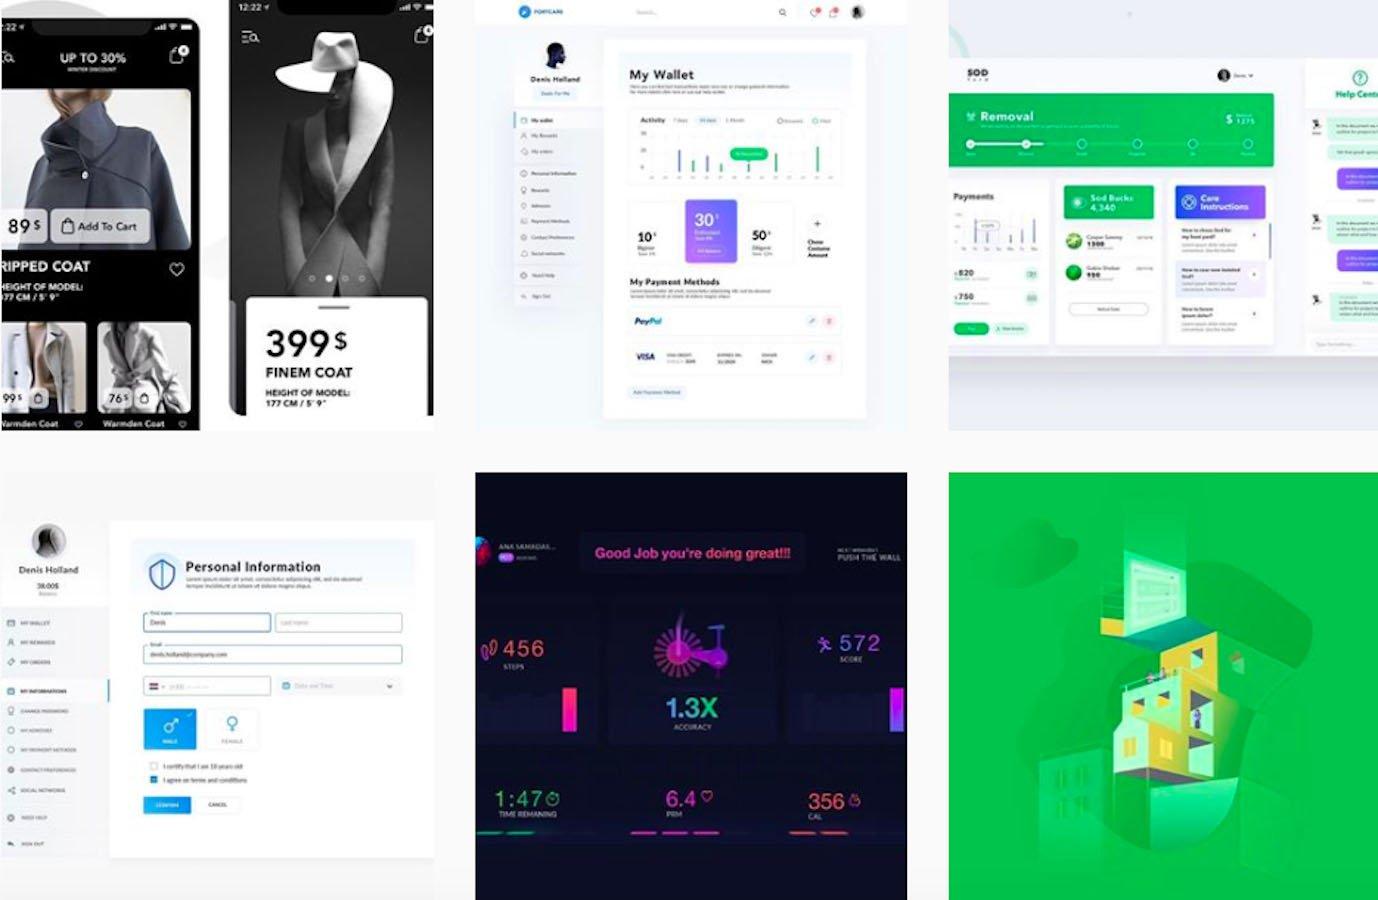 Web Design Inspiration: 110+ Accounts On Instagram and 10+ Best UX & Web Design Books in 2020 - nick buturishvili